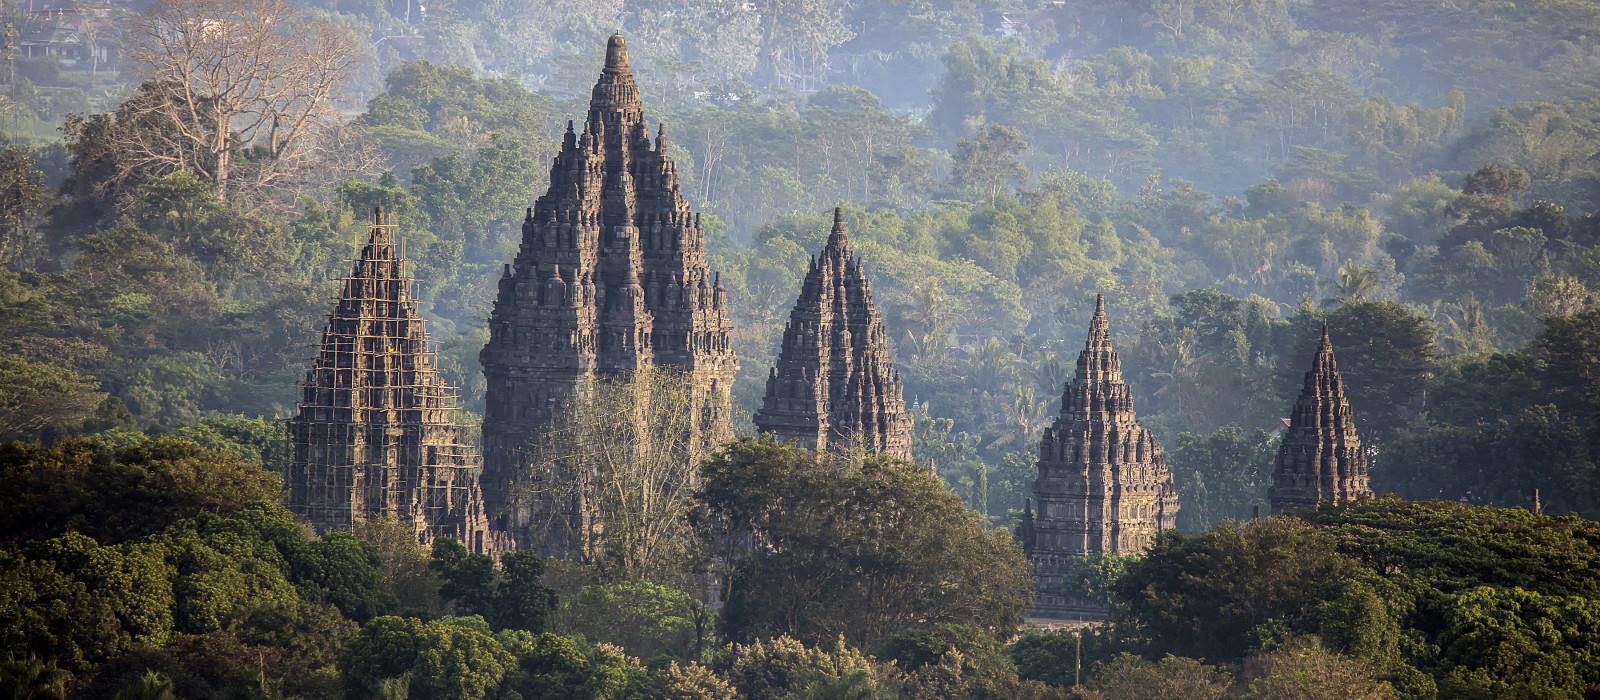 Mystical Prambanan Temple in the Morning, Indonesia, Asia